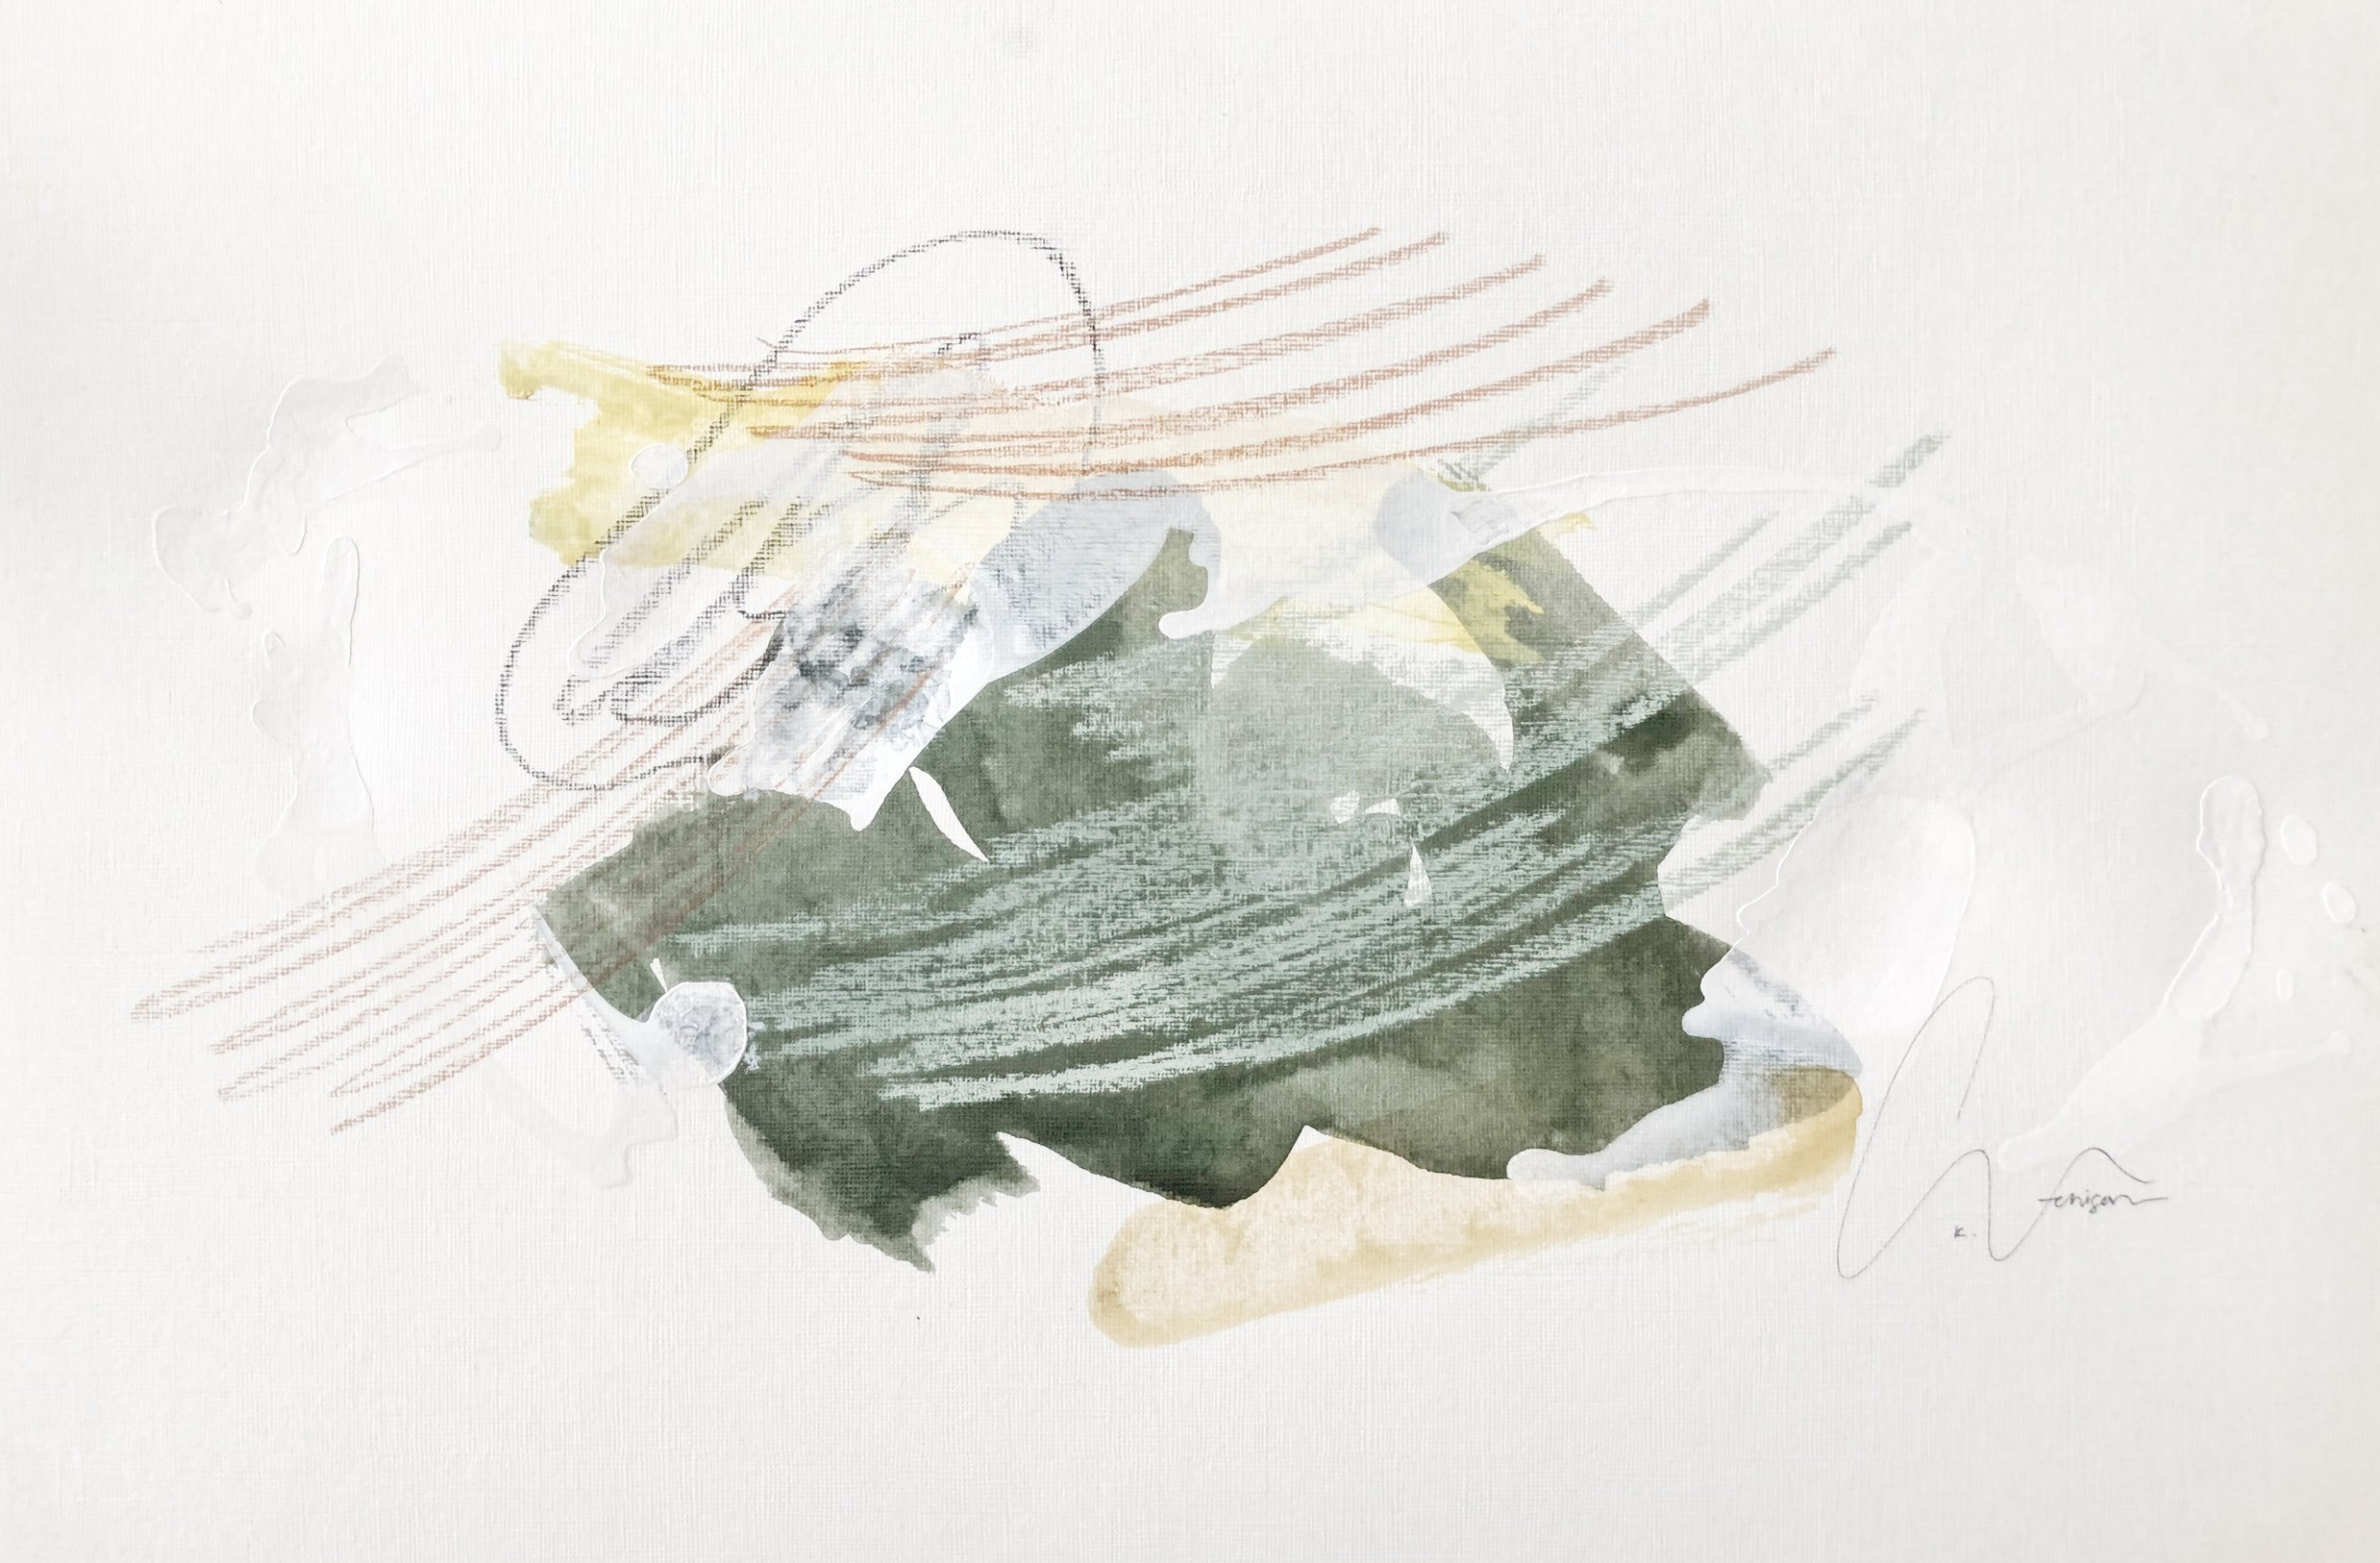 moss ii - 18 x 12 | mixed media on paper